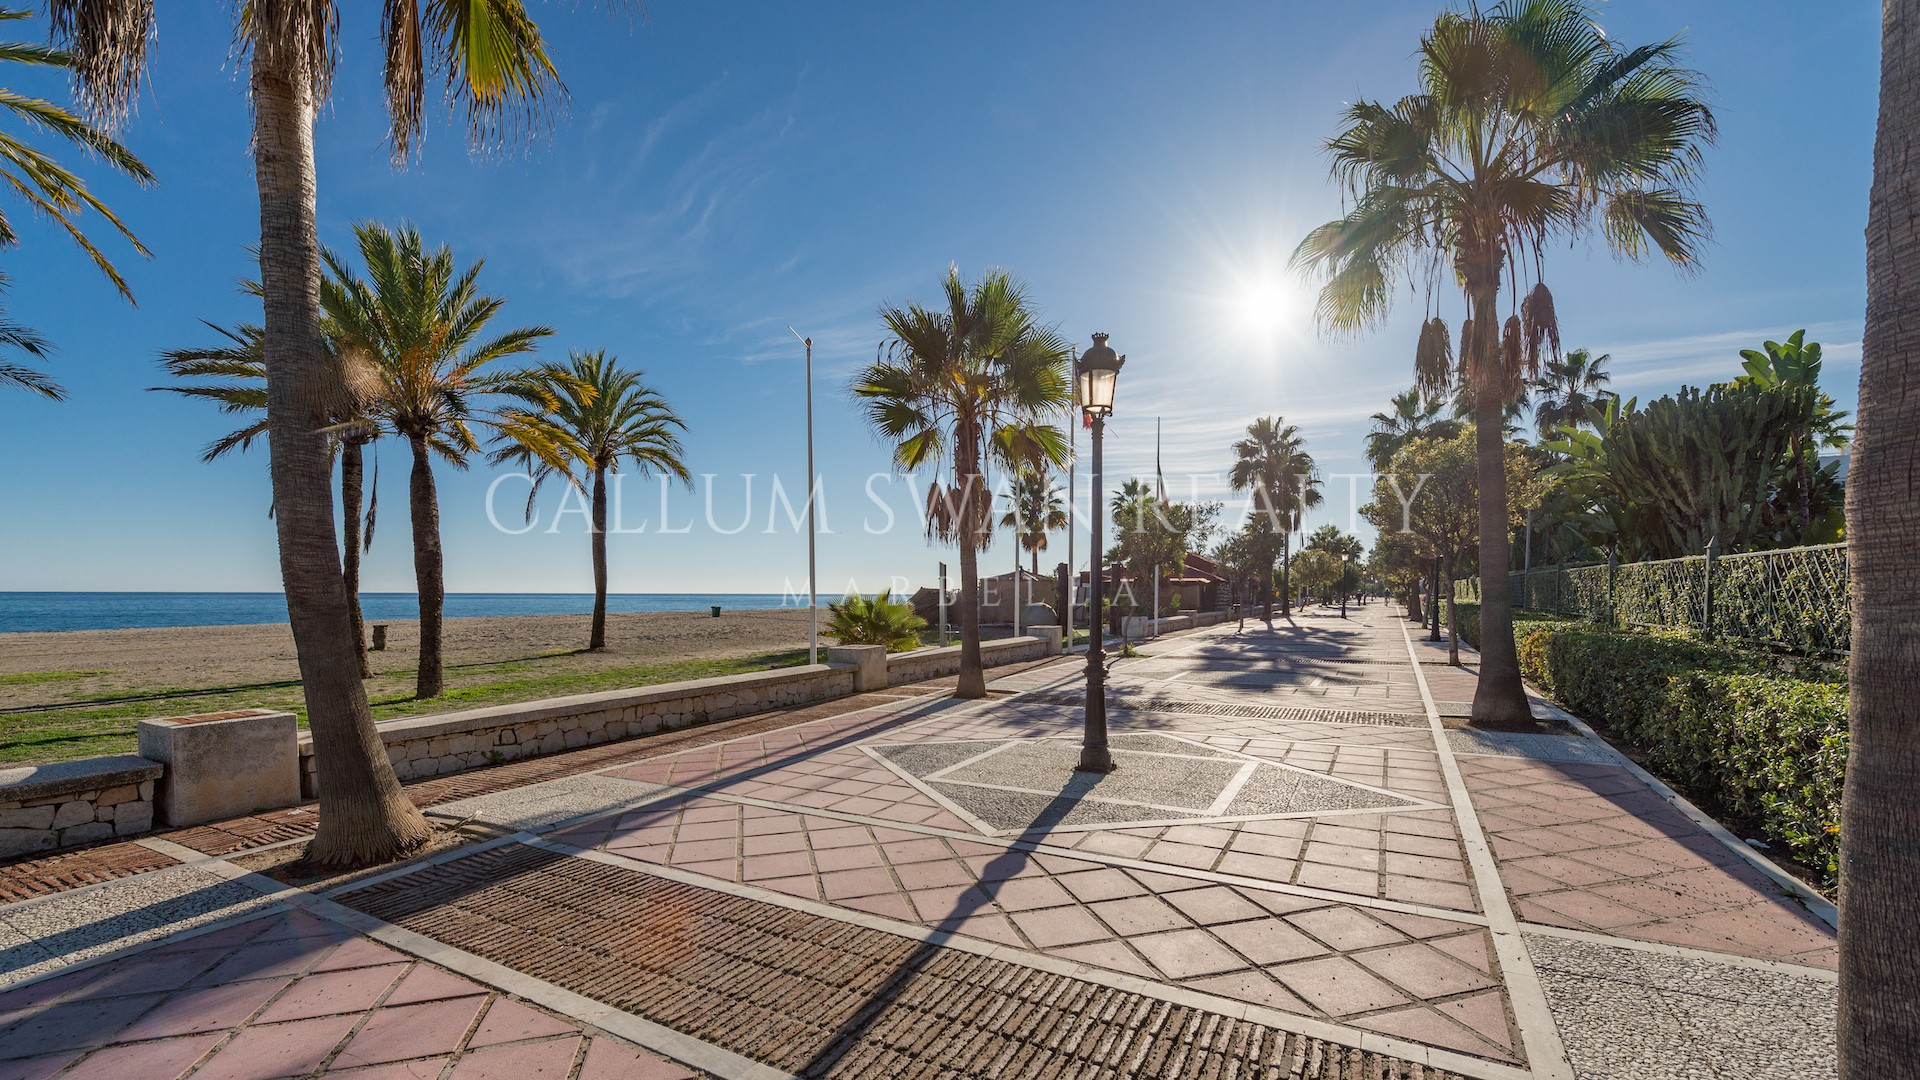 Marbella's beautiful seafront